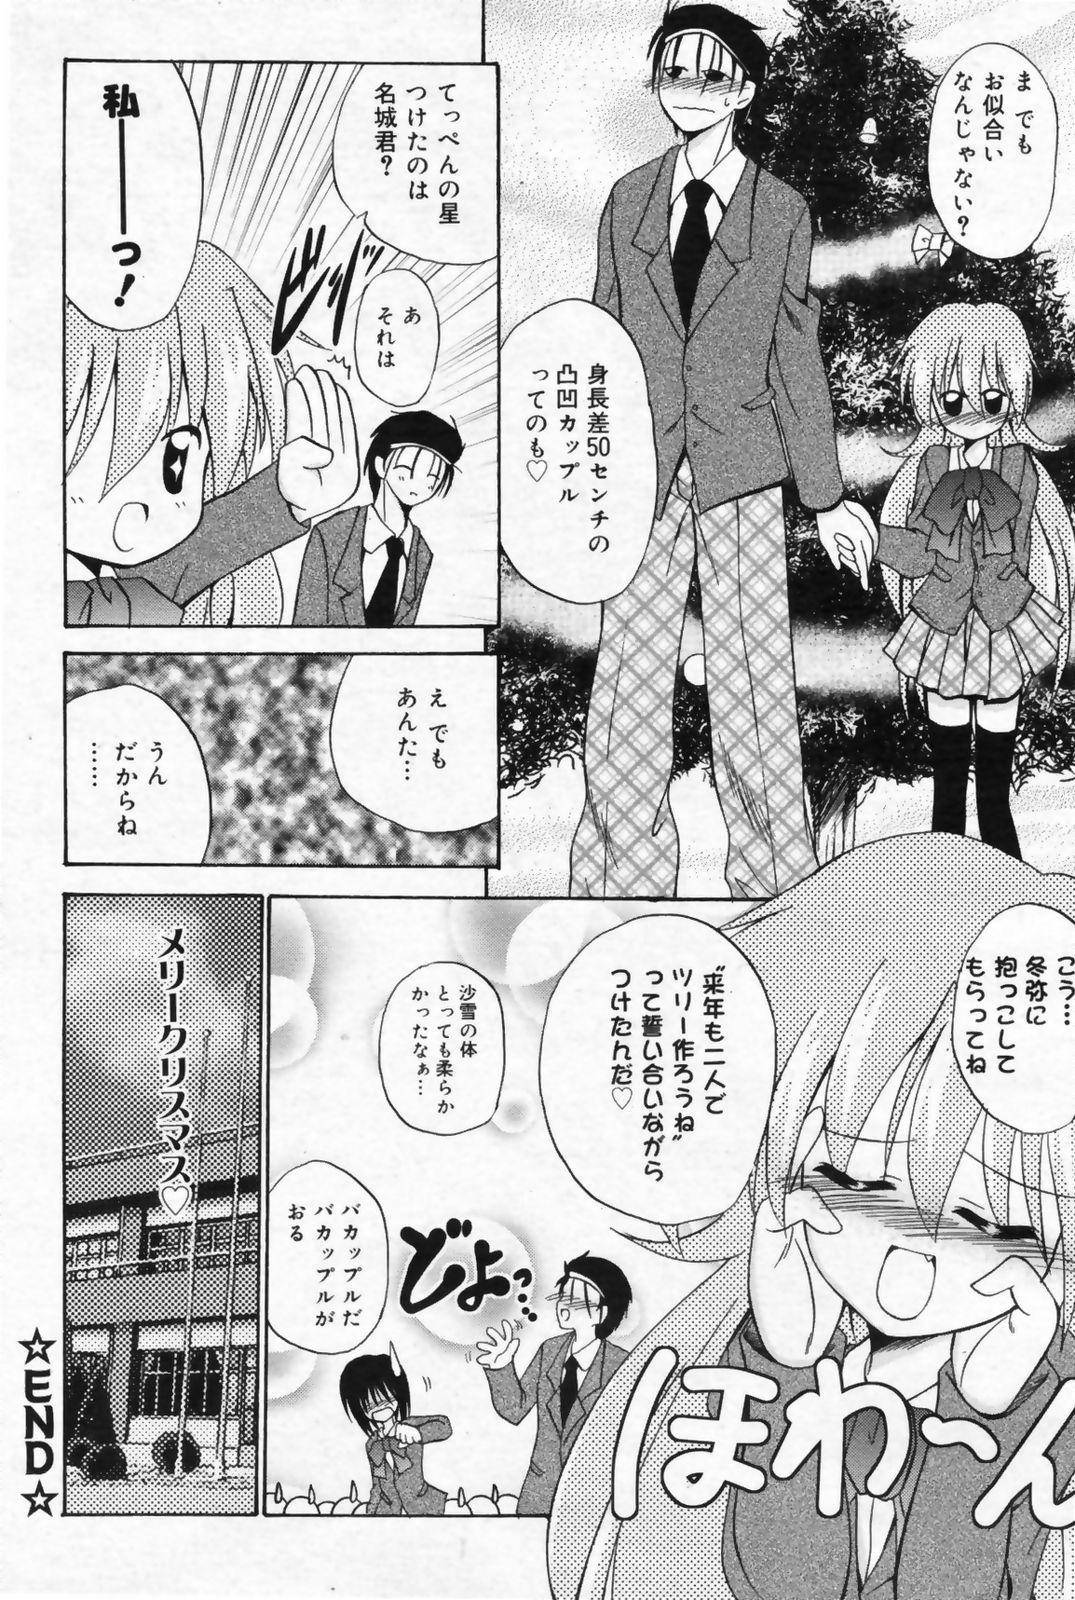 Manga Bangaichi 2009-02 Vol. 234 177